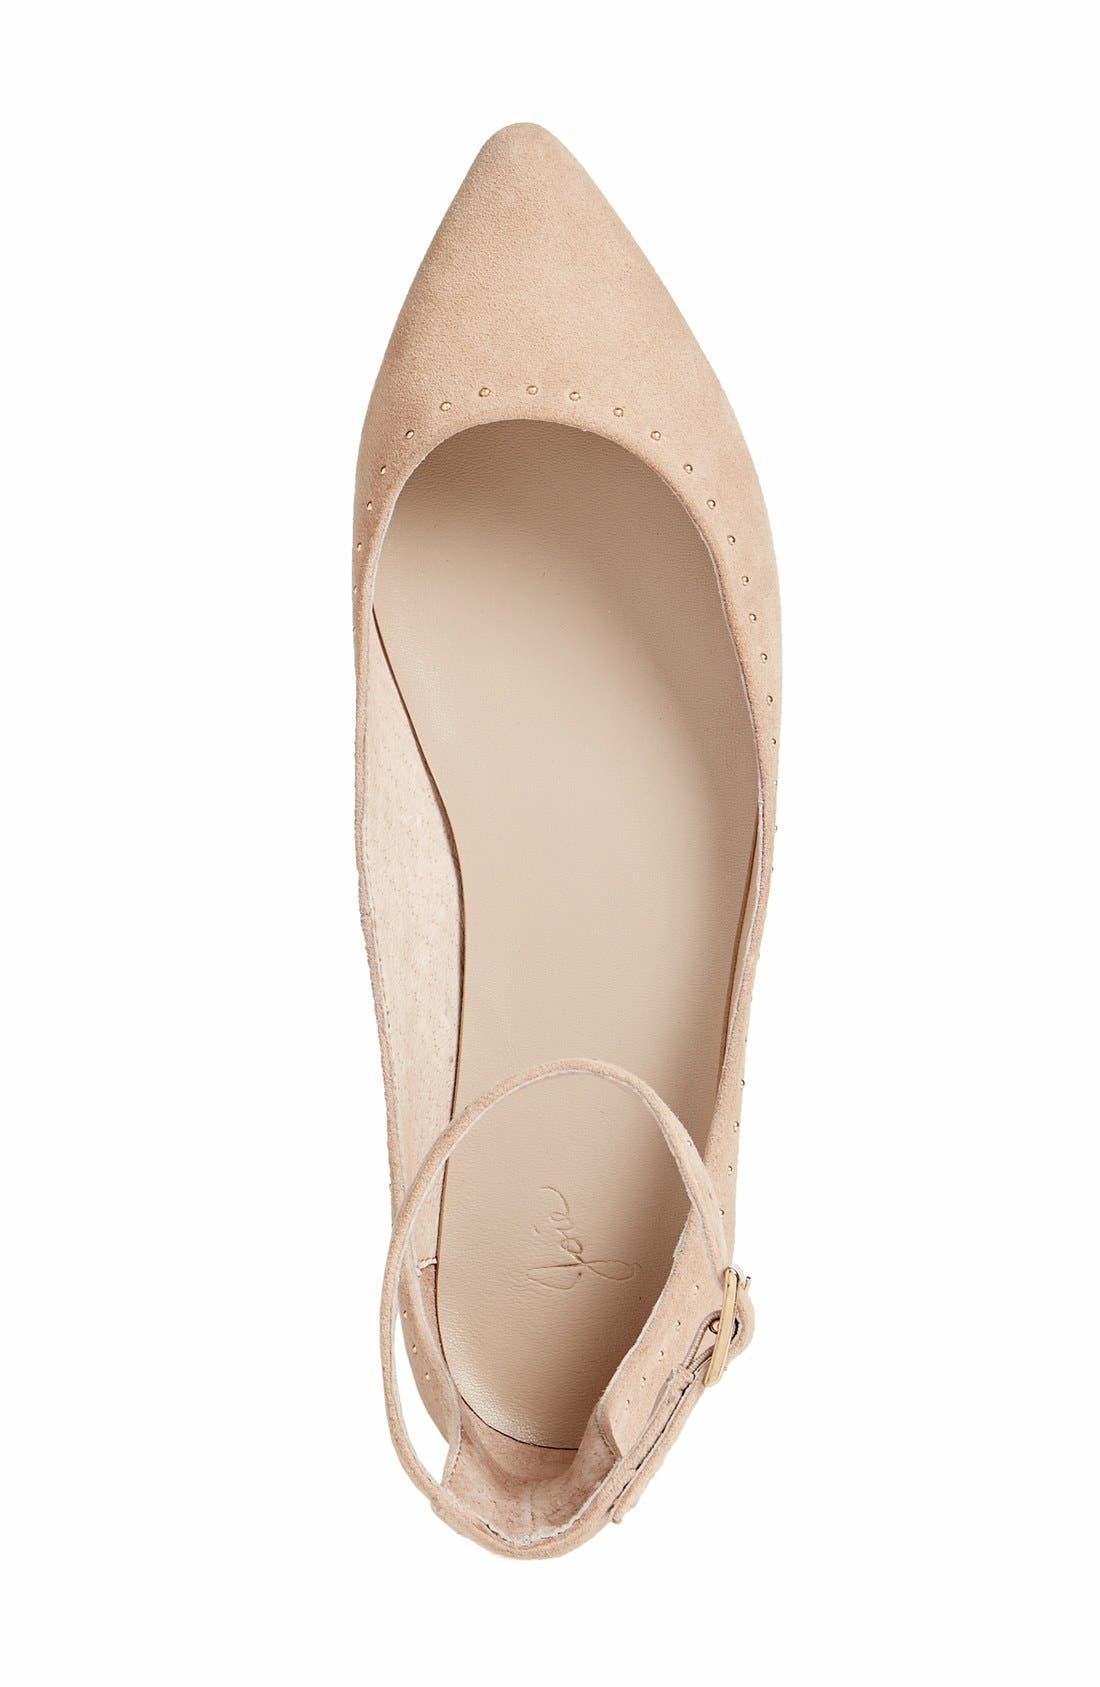 Afra Ankle Strap Ballet Flat,                             Alternate thumbnail 4, color,                             250